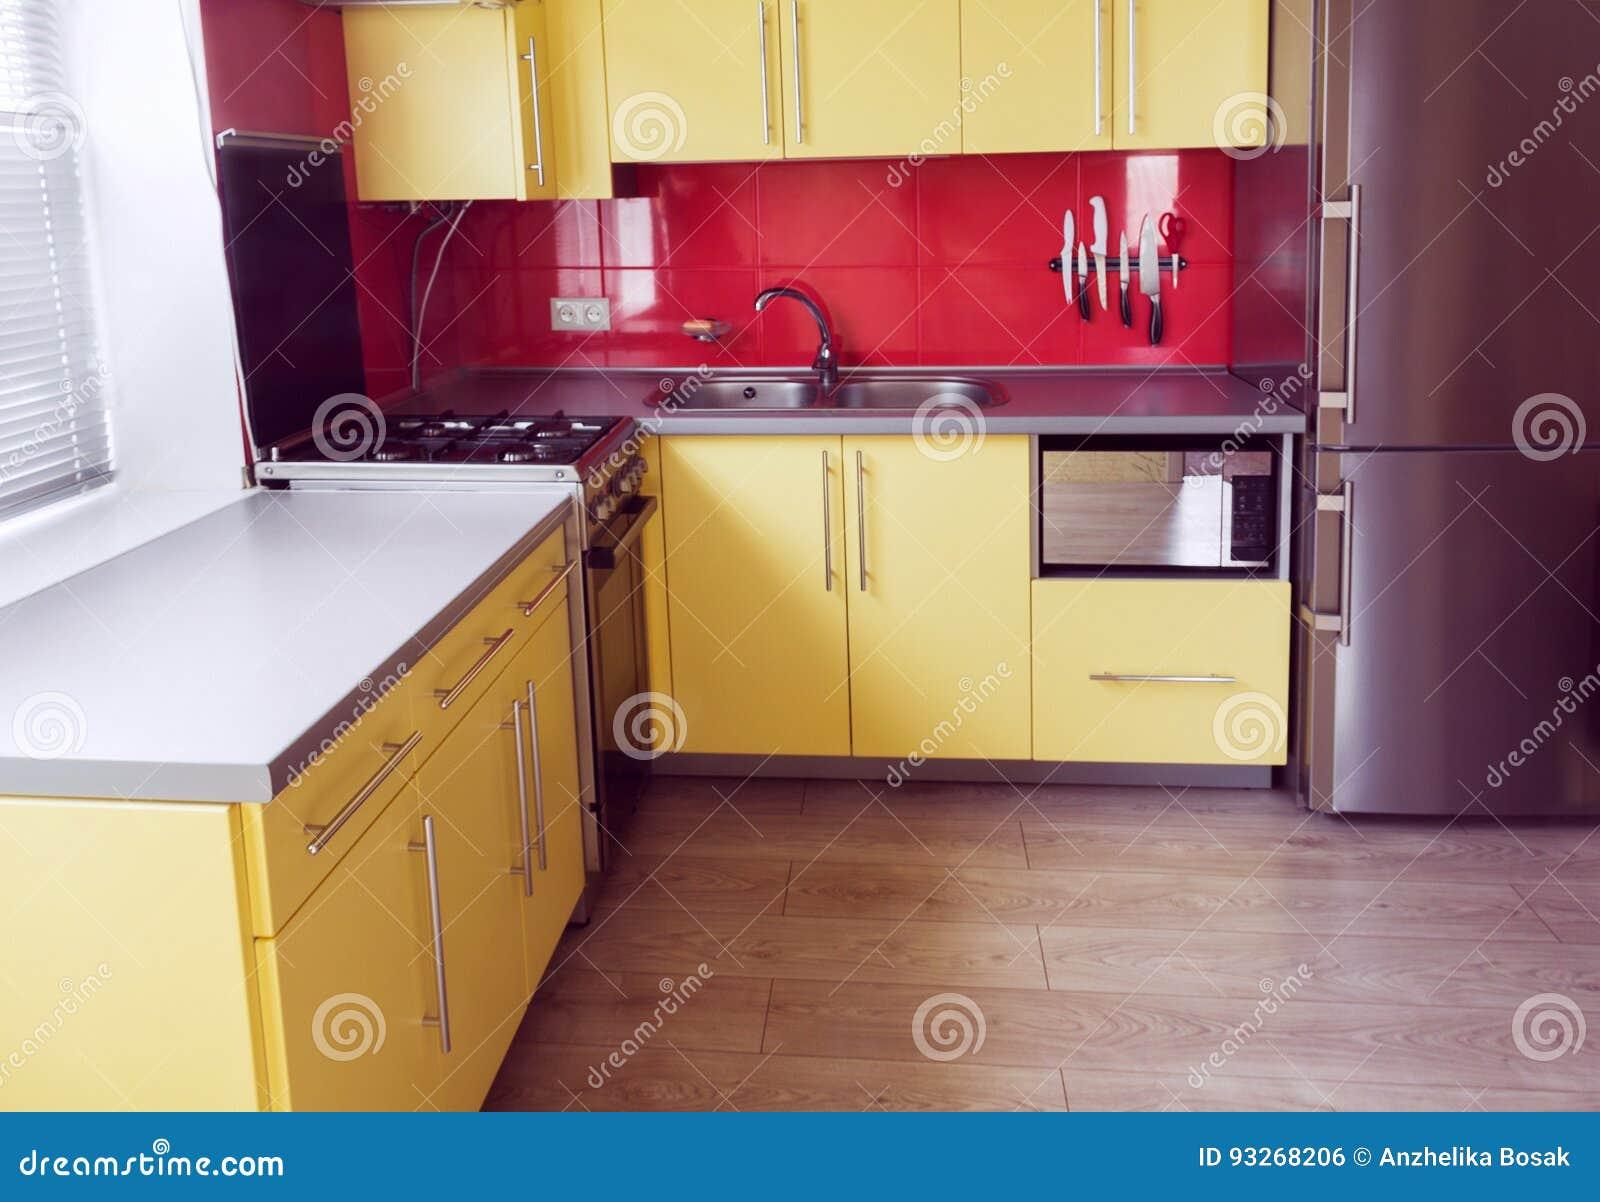 Gelbes Haus Graue Fenster - Heimidee